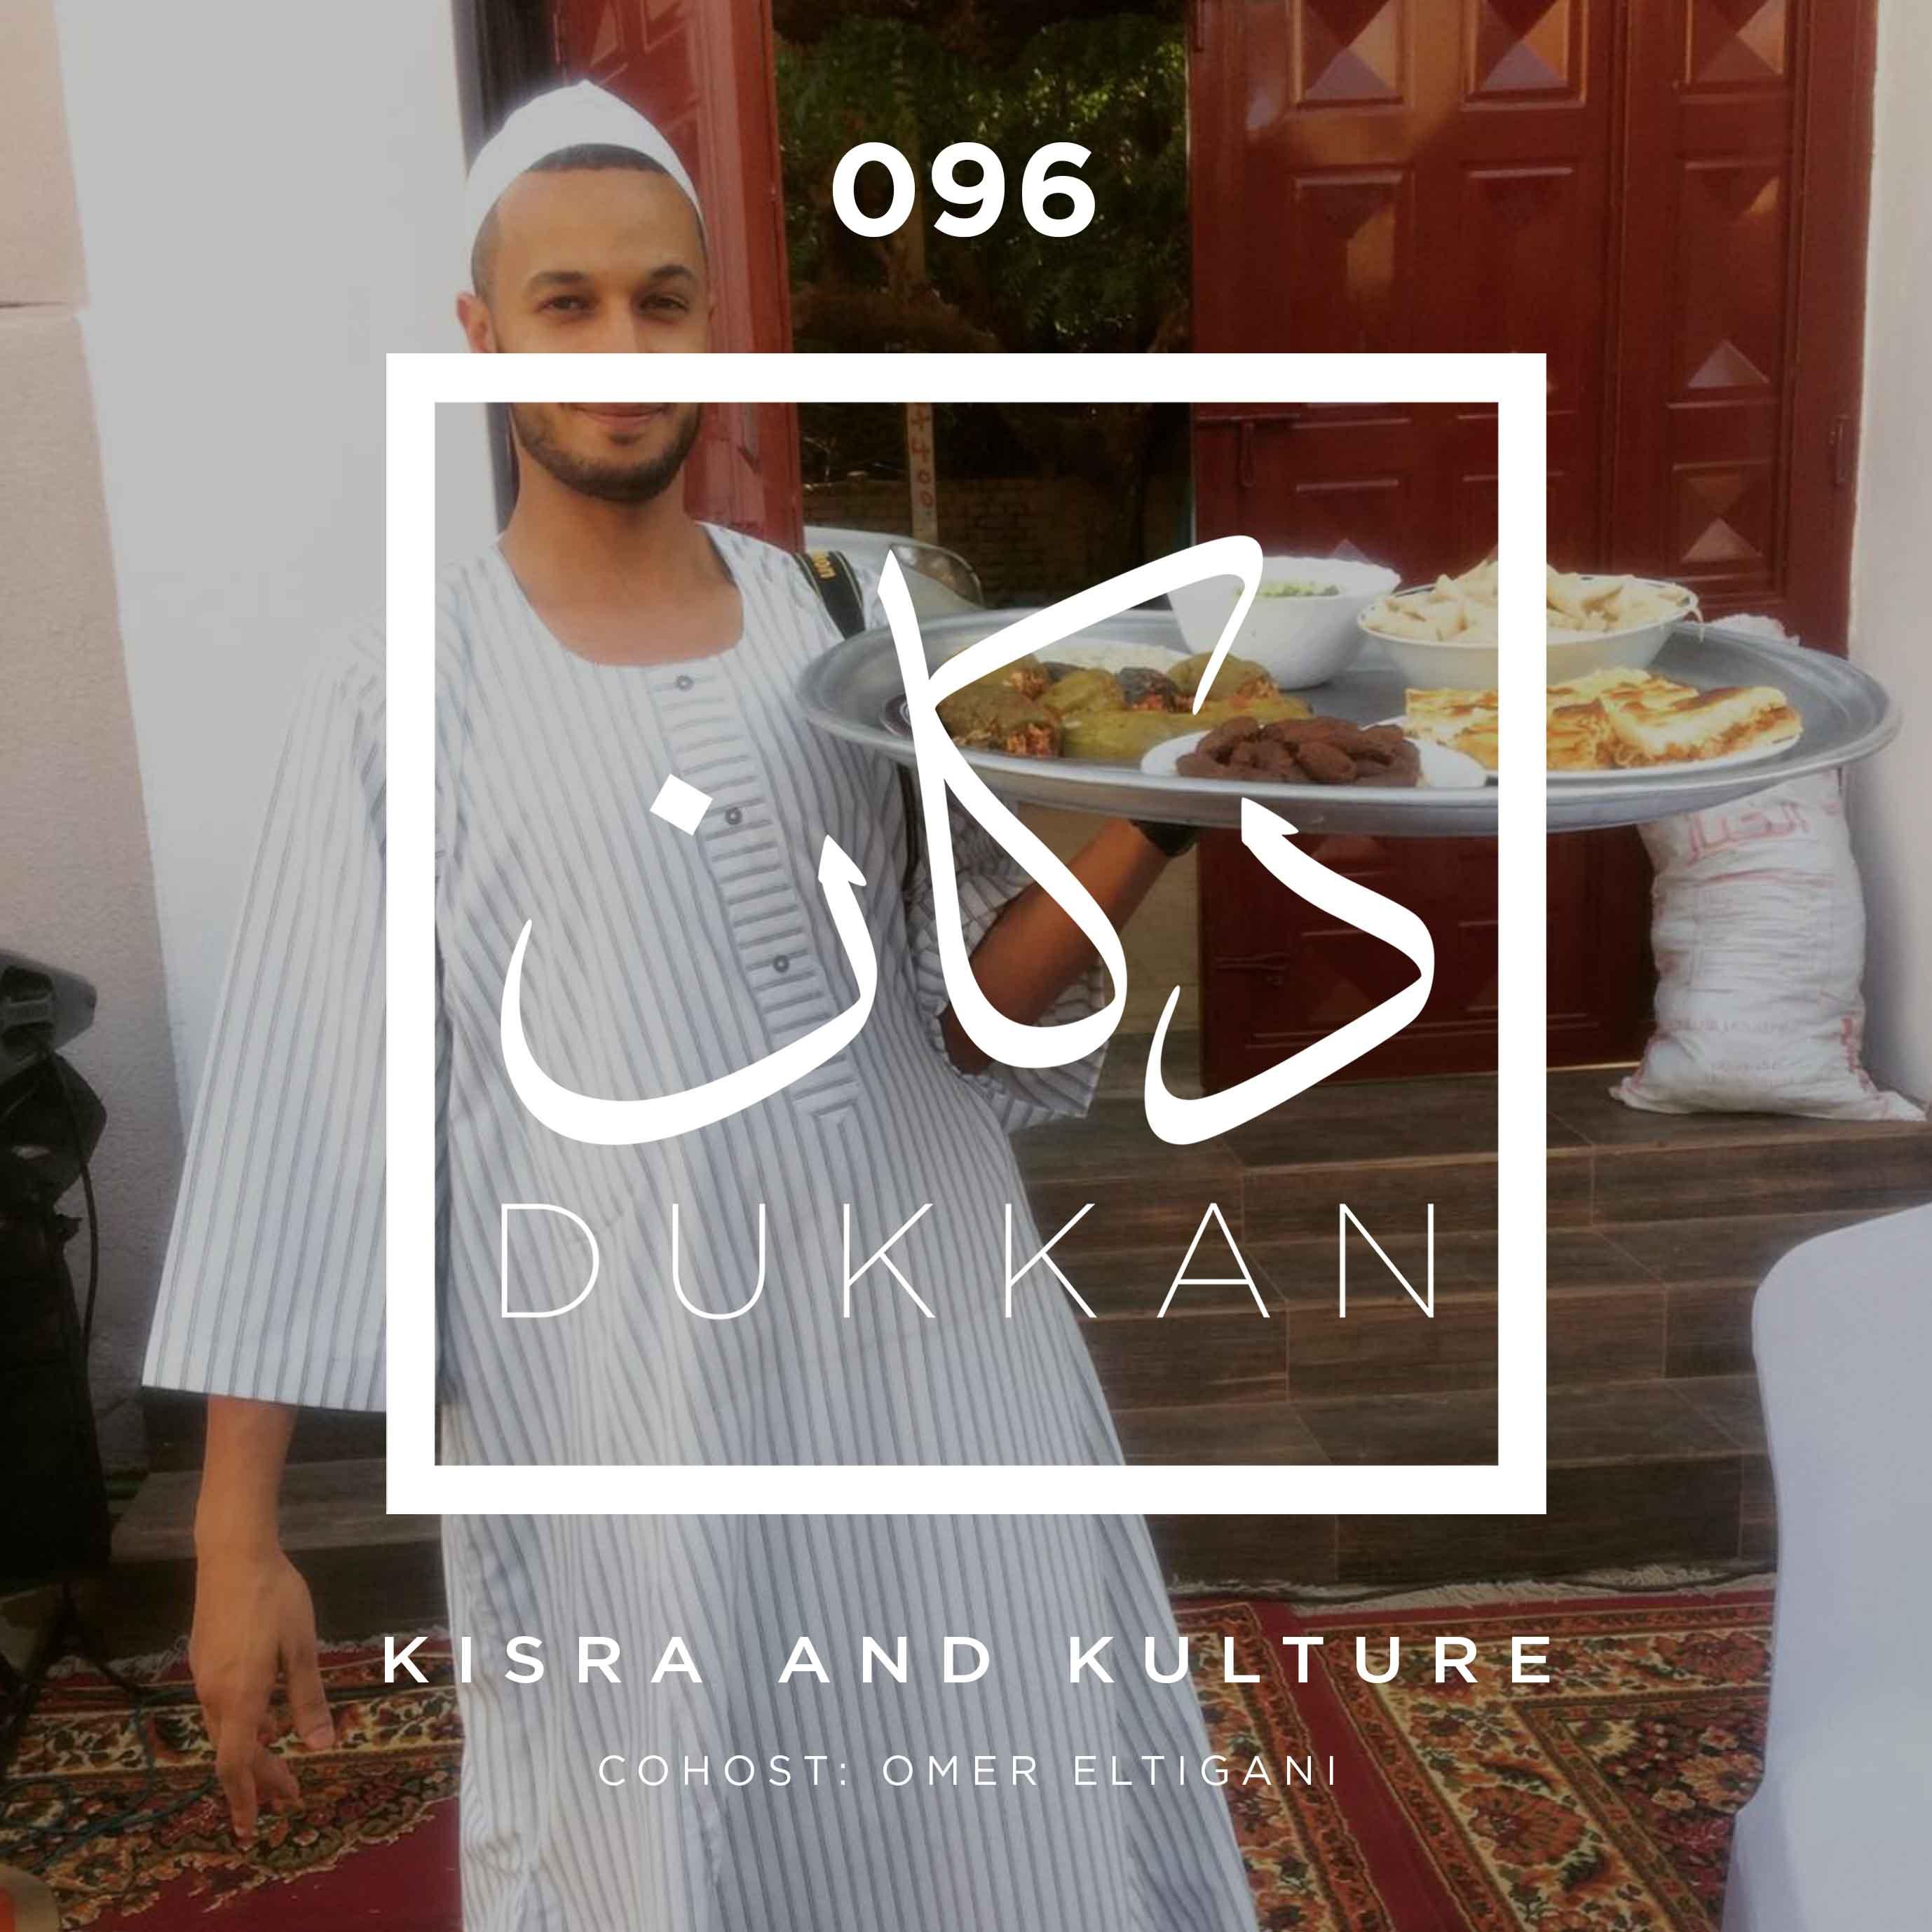 E096: Kisra And Kulture (Cohost: Omer Eltigani)